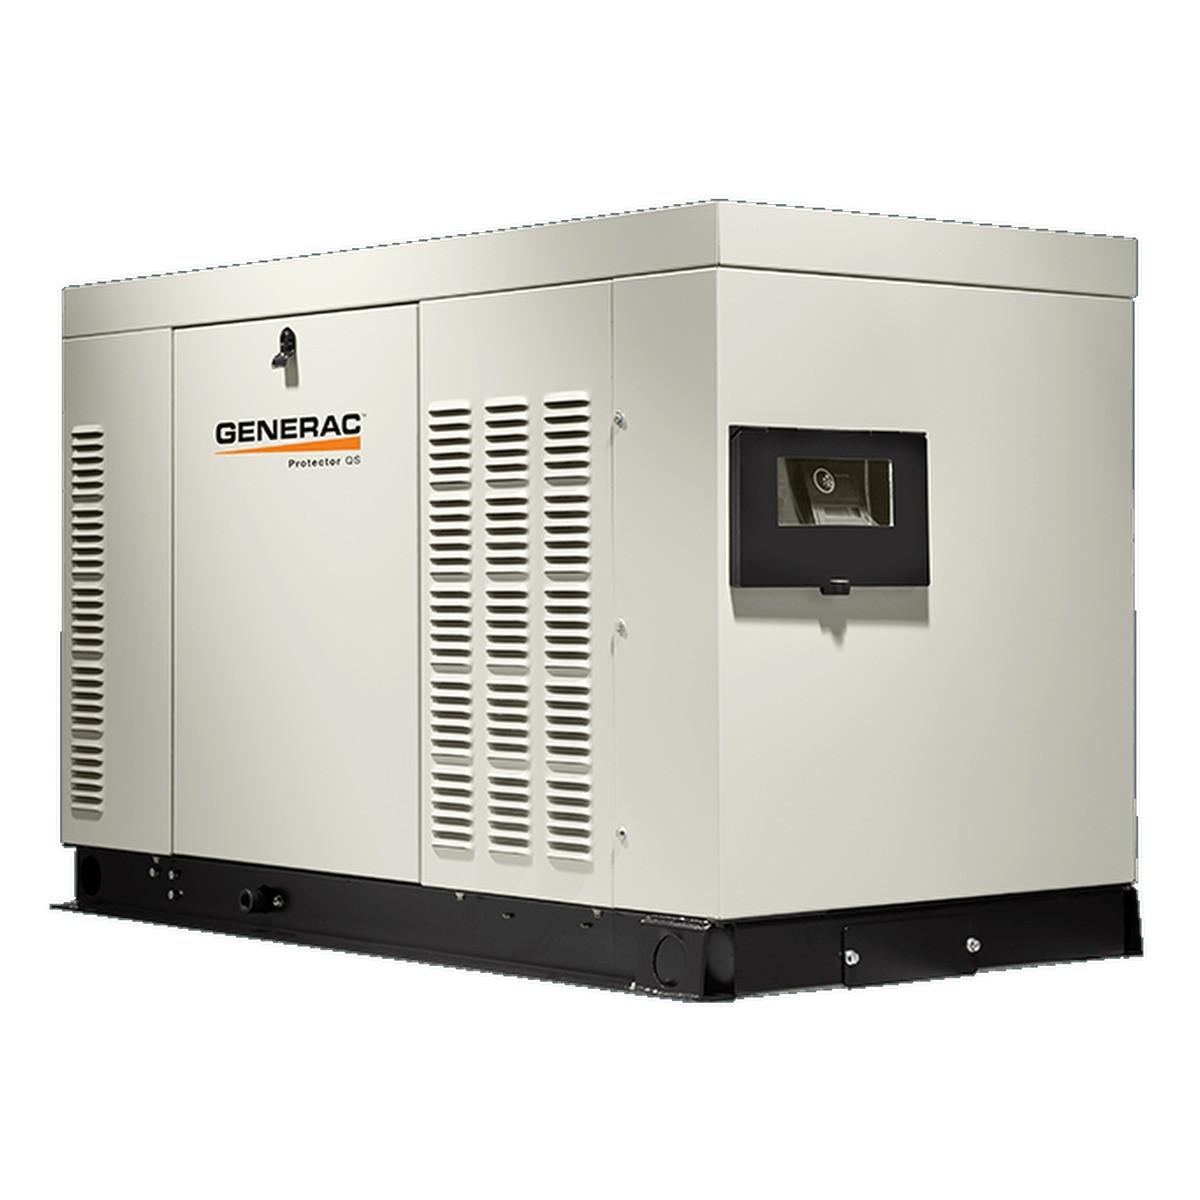 hight resolution of generac protector series rg03015 30kw generator rh apelectric com generac transfer switch wiring diagram generac transfer switch wiring diagram